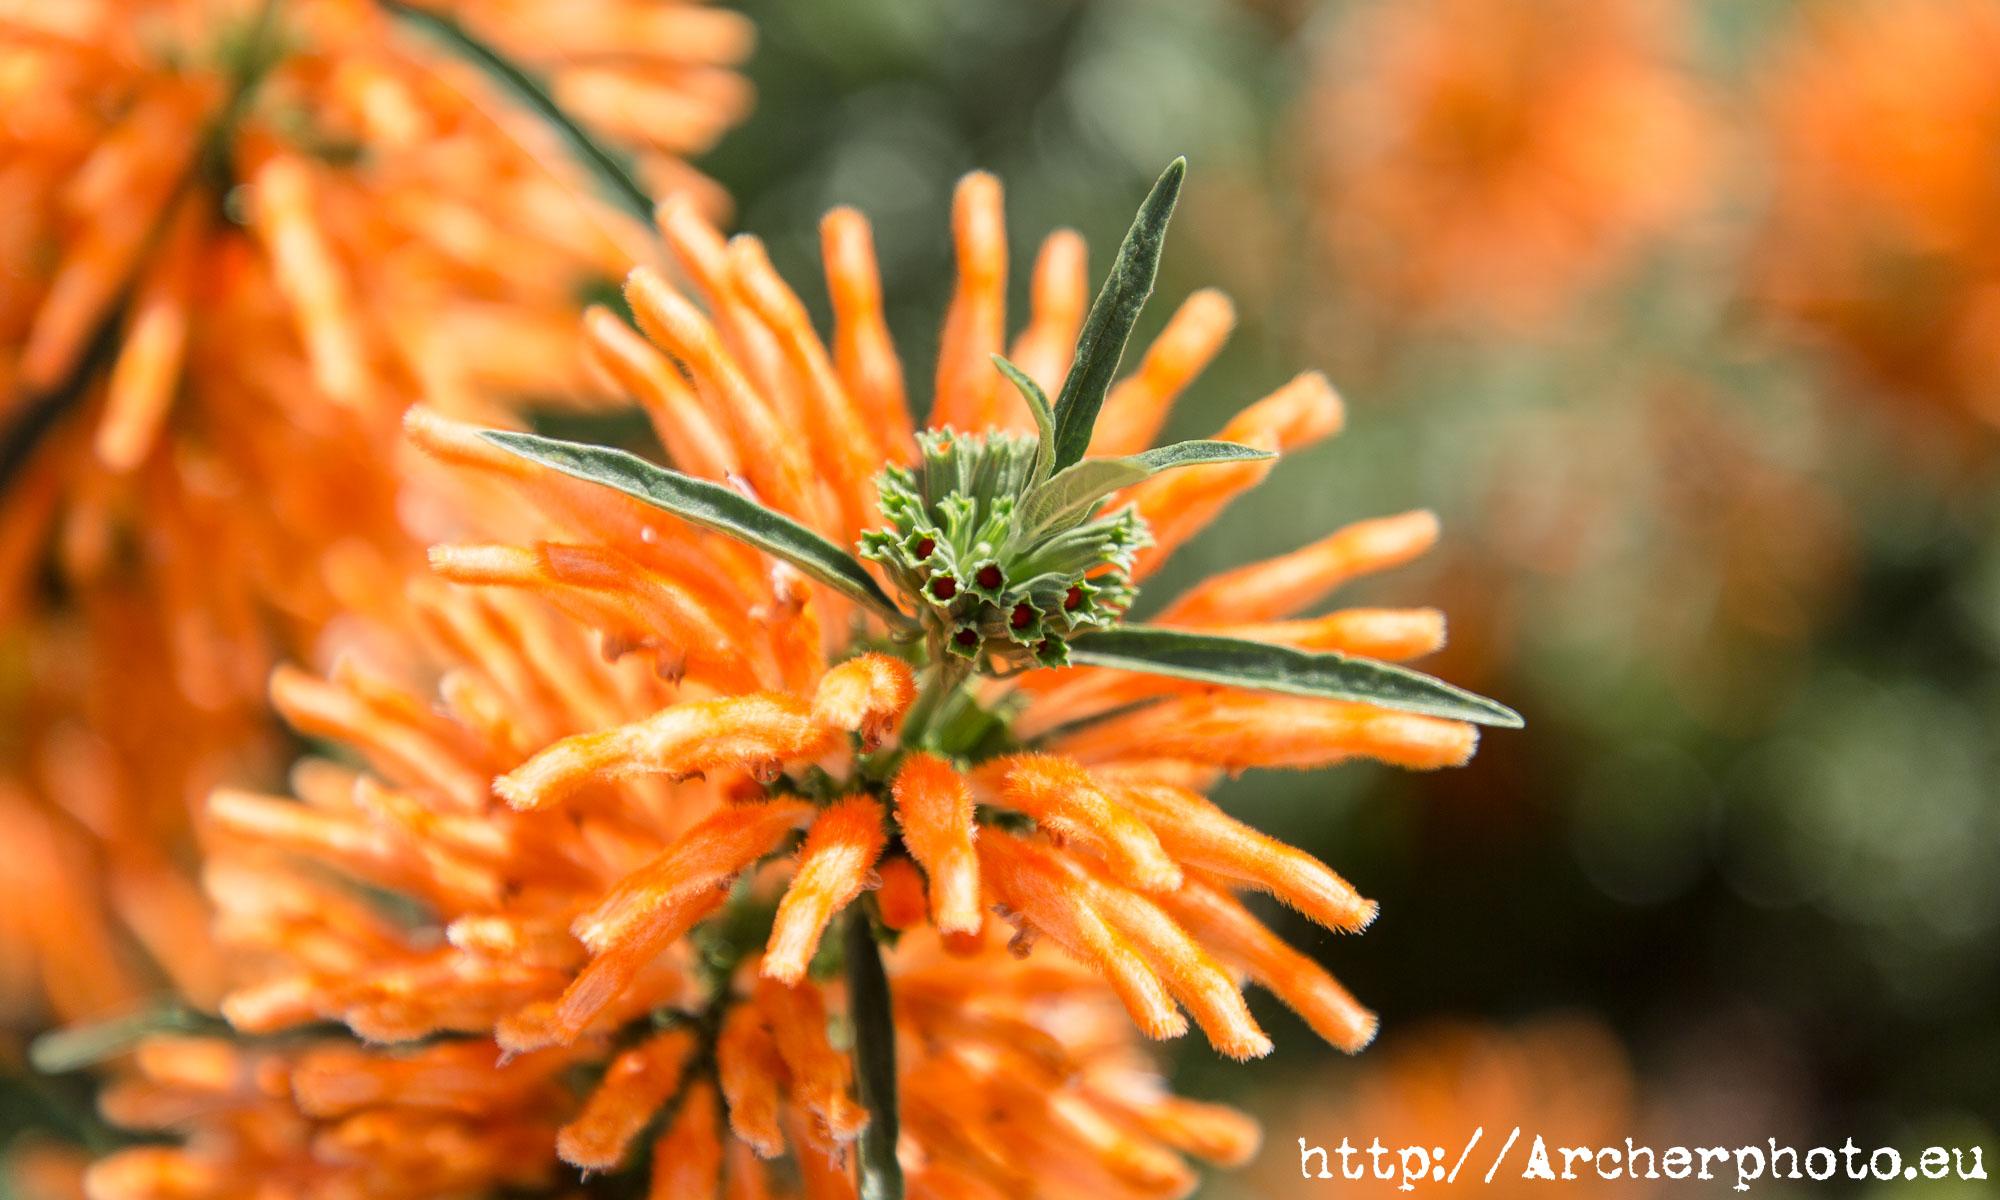 Flores en Parque Central de València, por Archerphoto